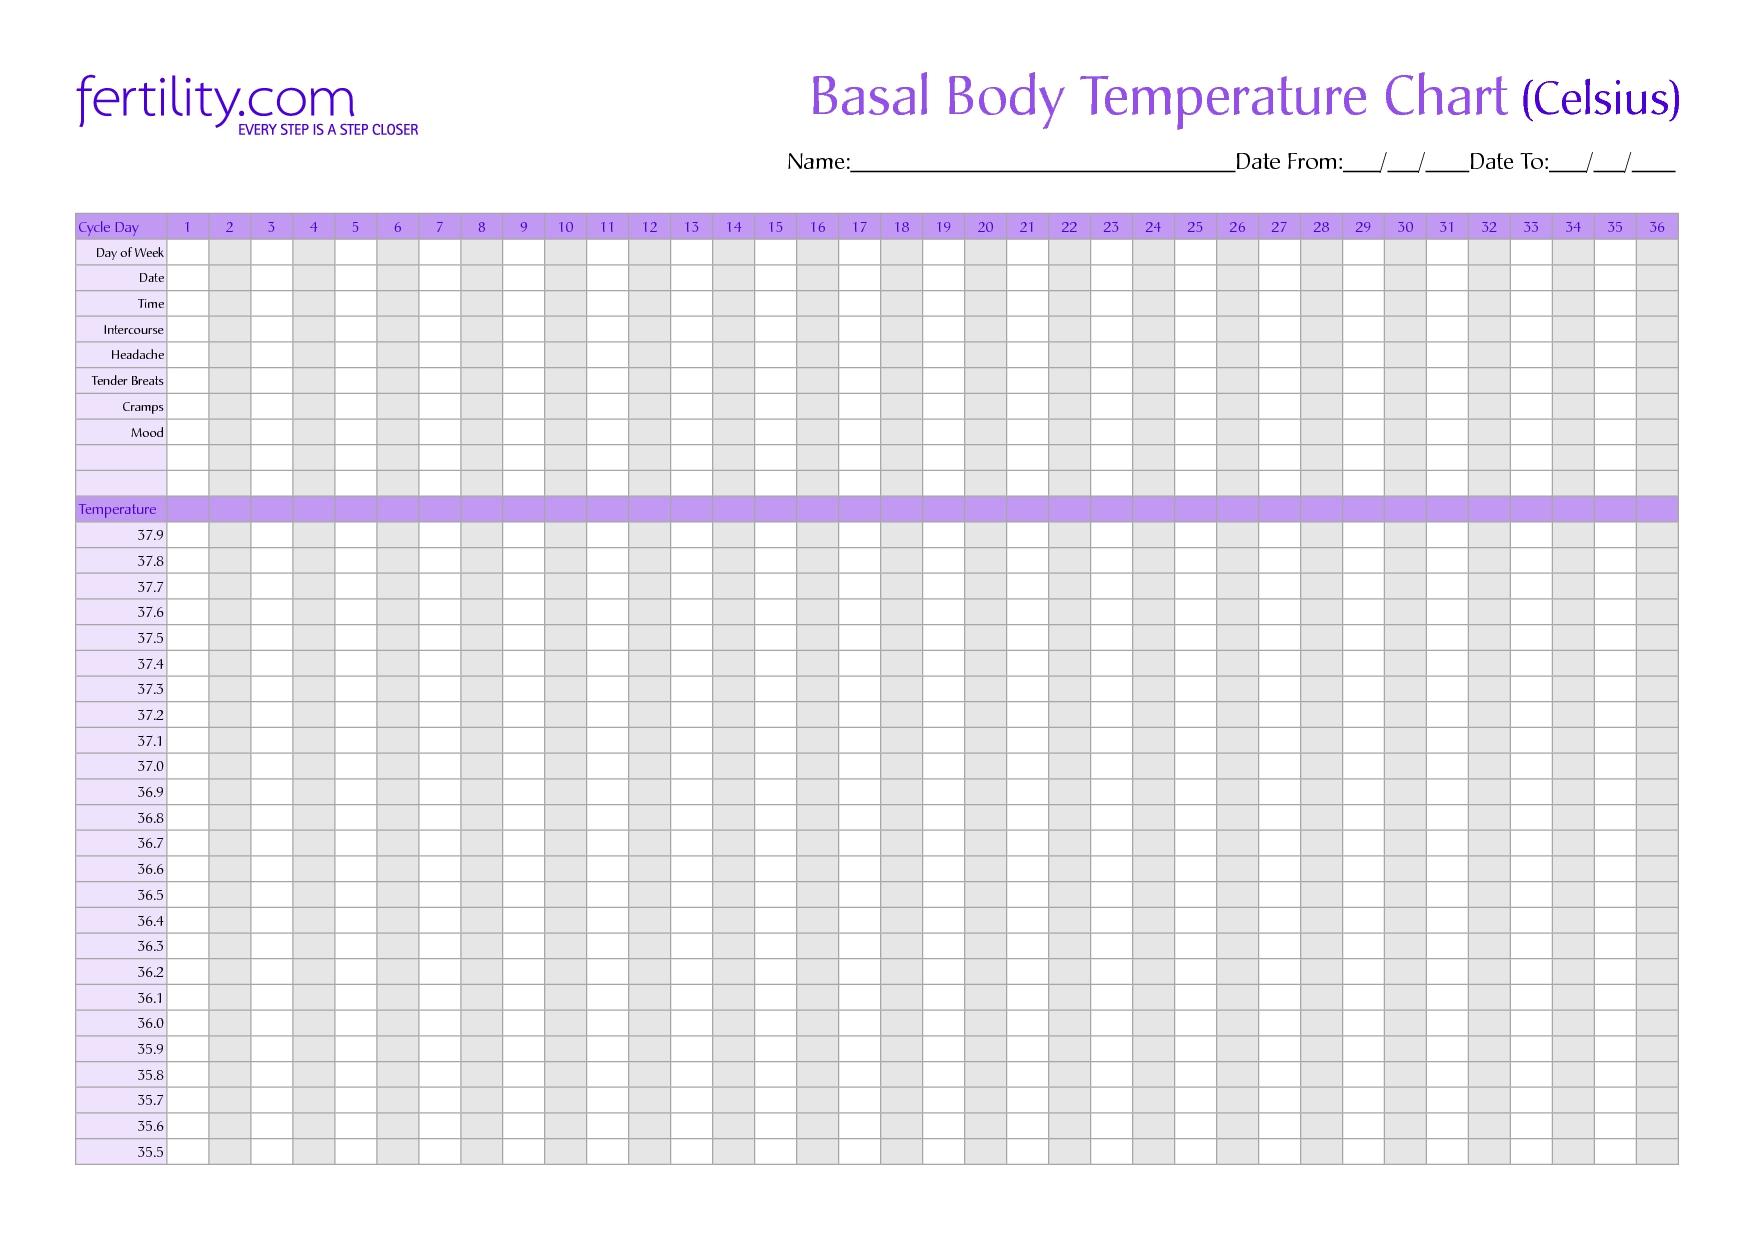 Printable Fertility Chart | Online Calendar Templates - Free Printable Fertility Chart